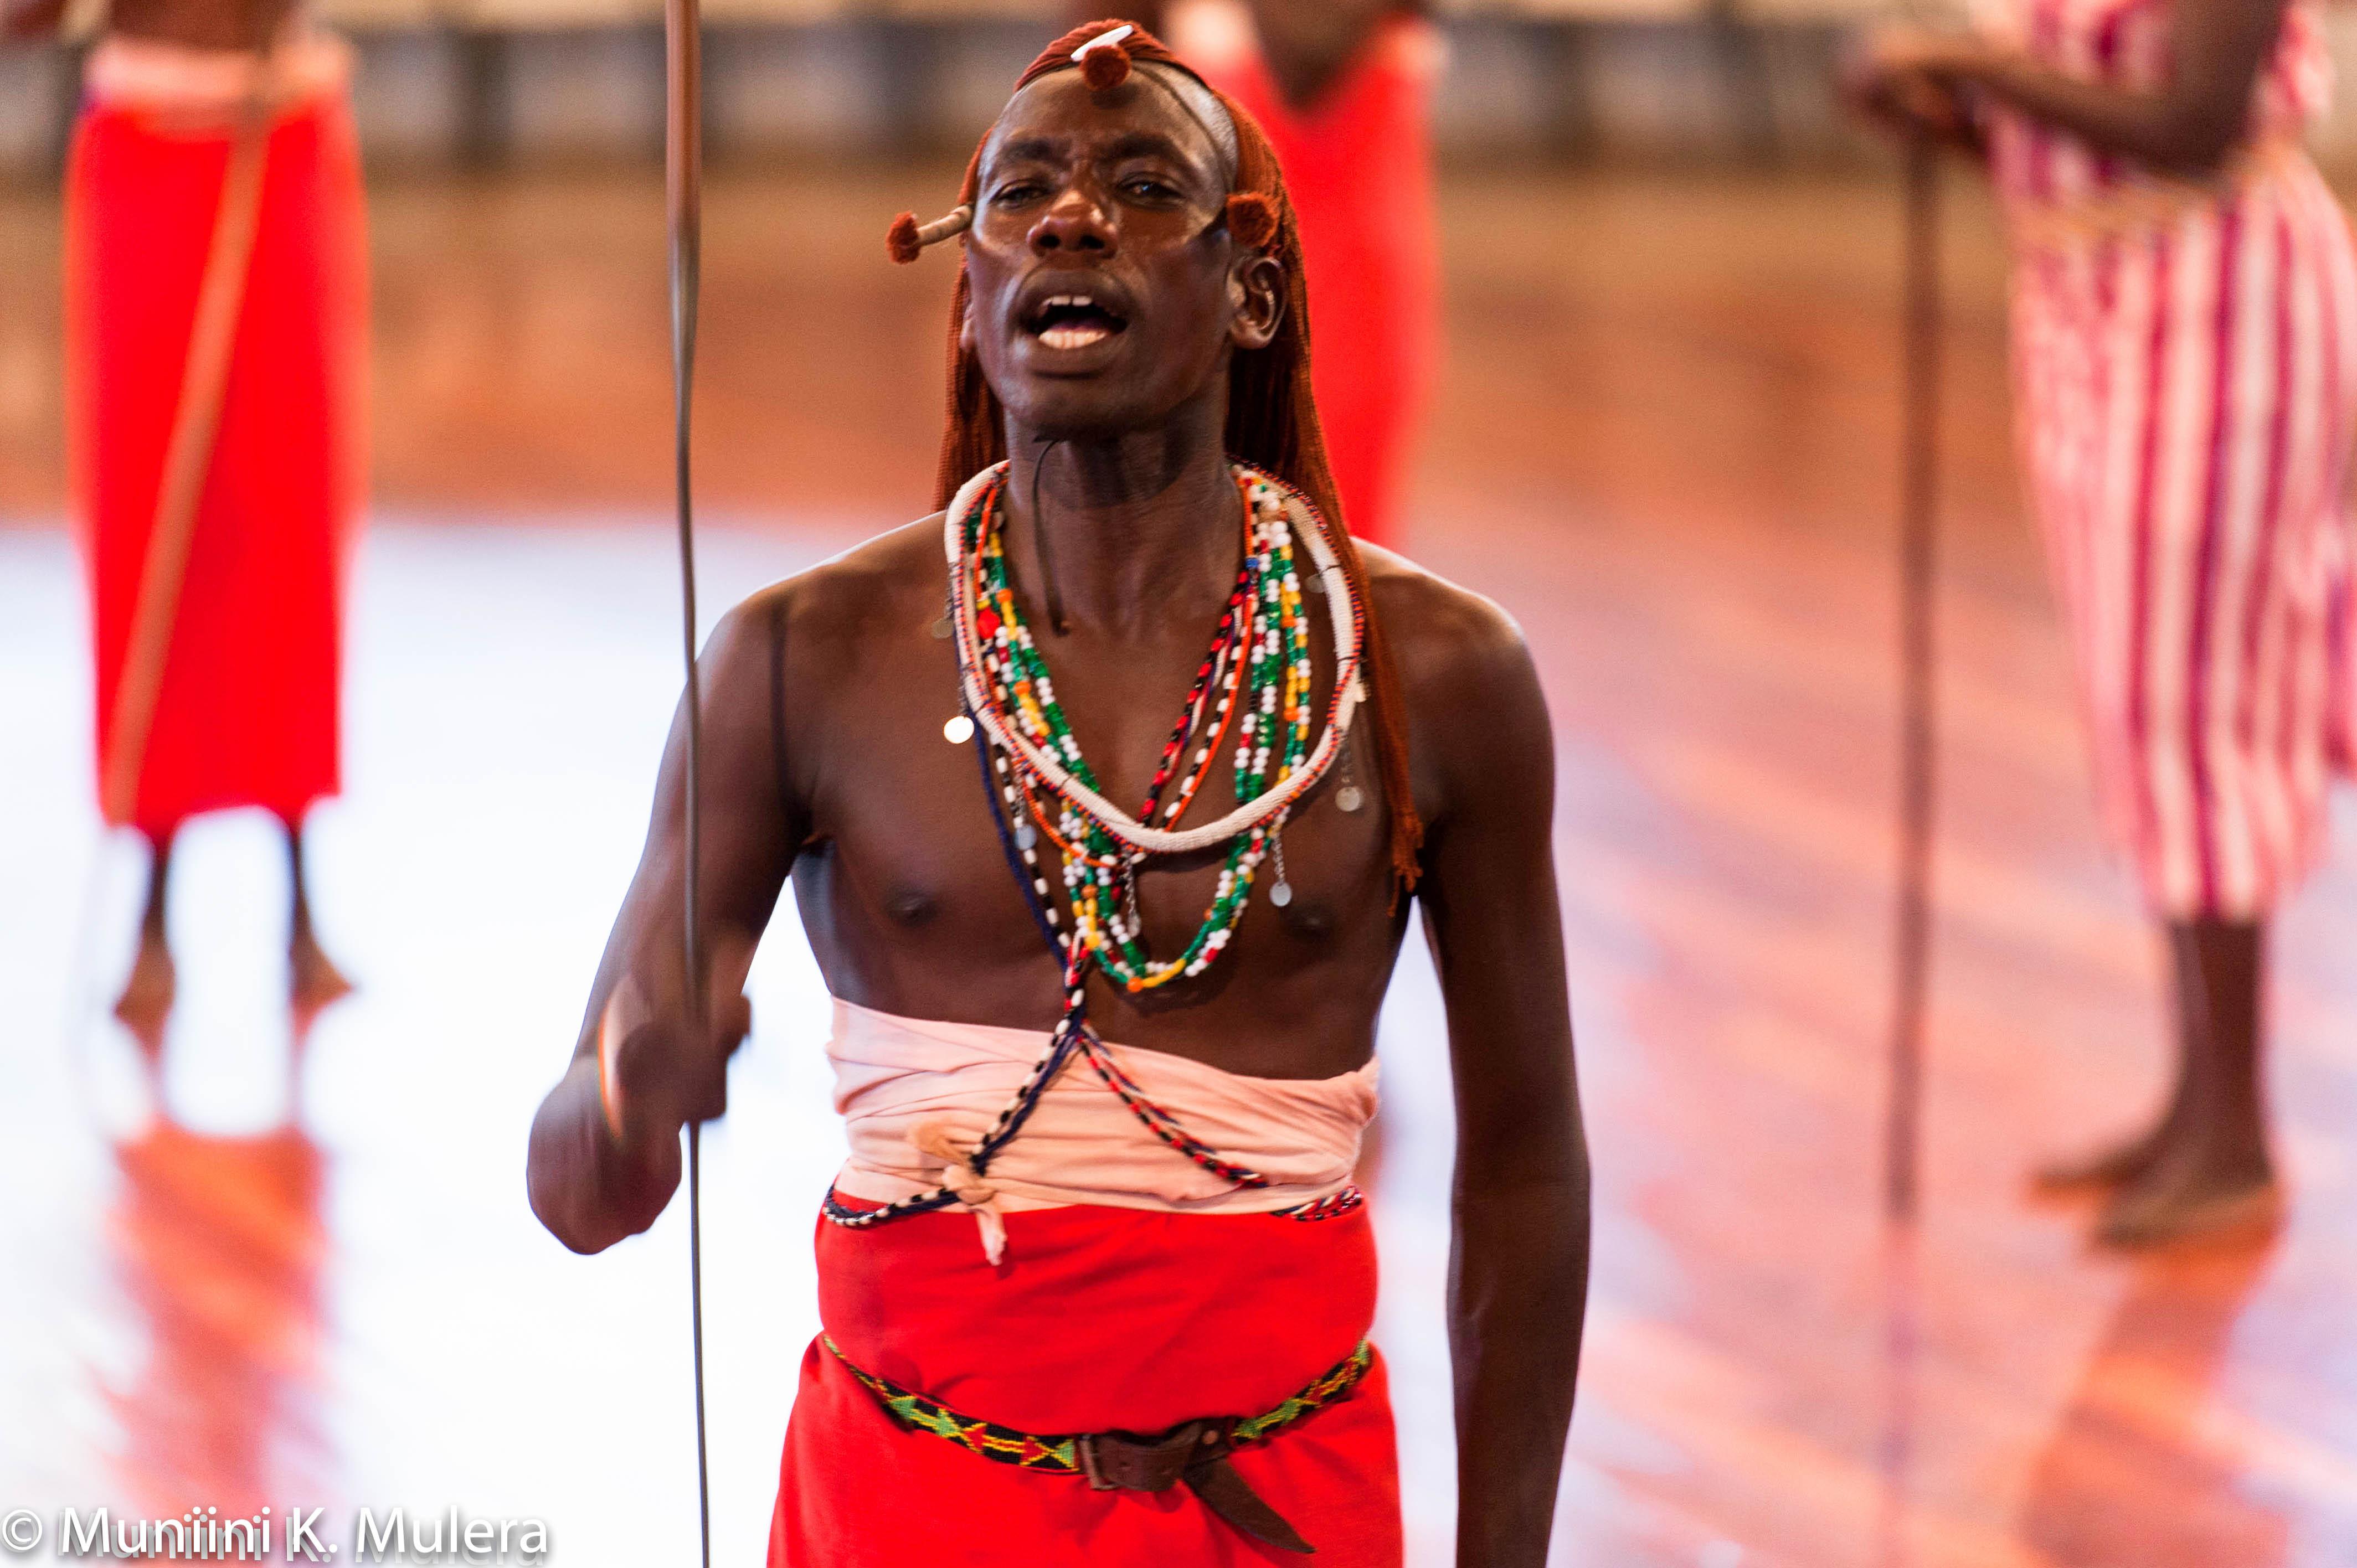 Bomas of Kenya male warrior dancer - Best